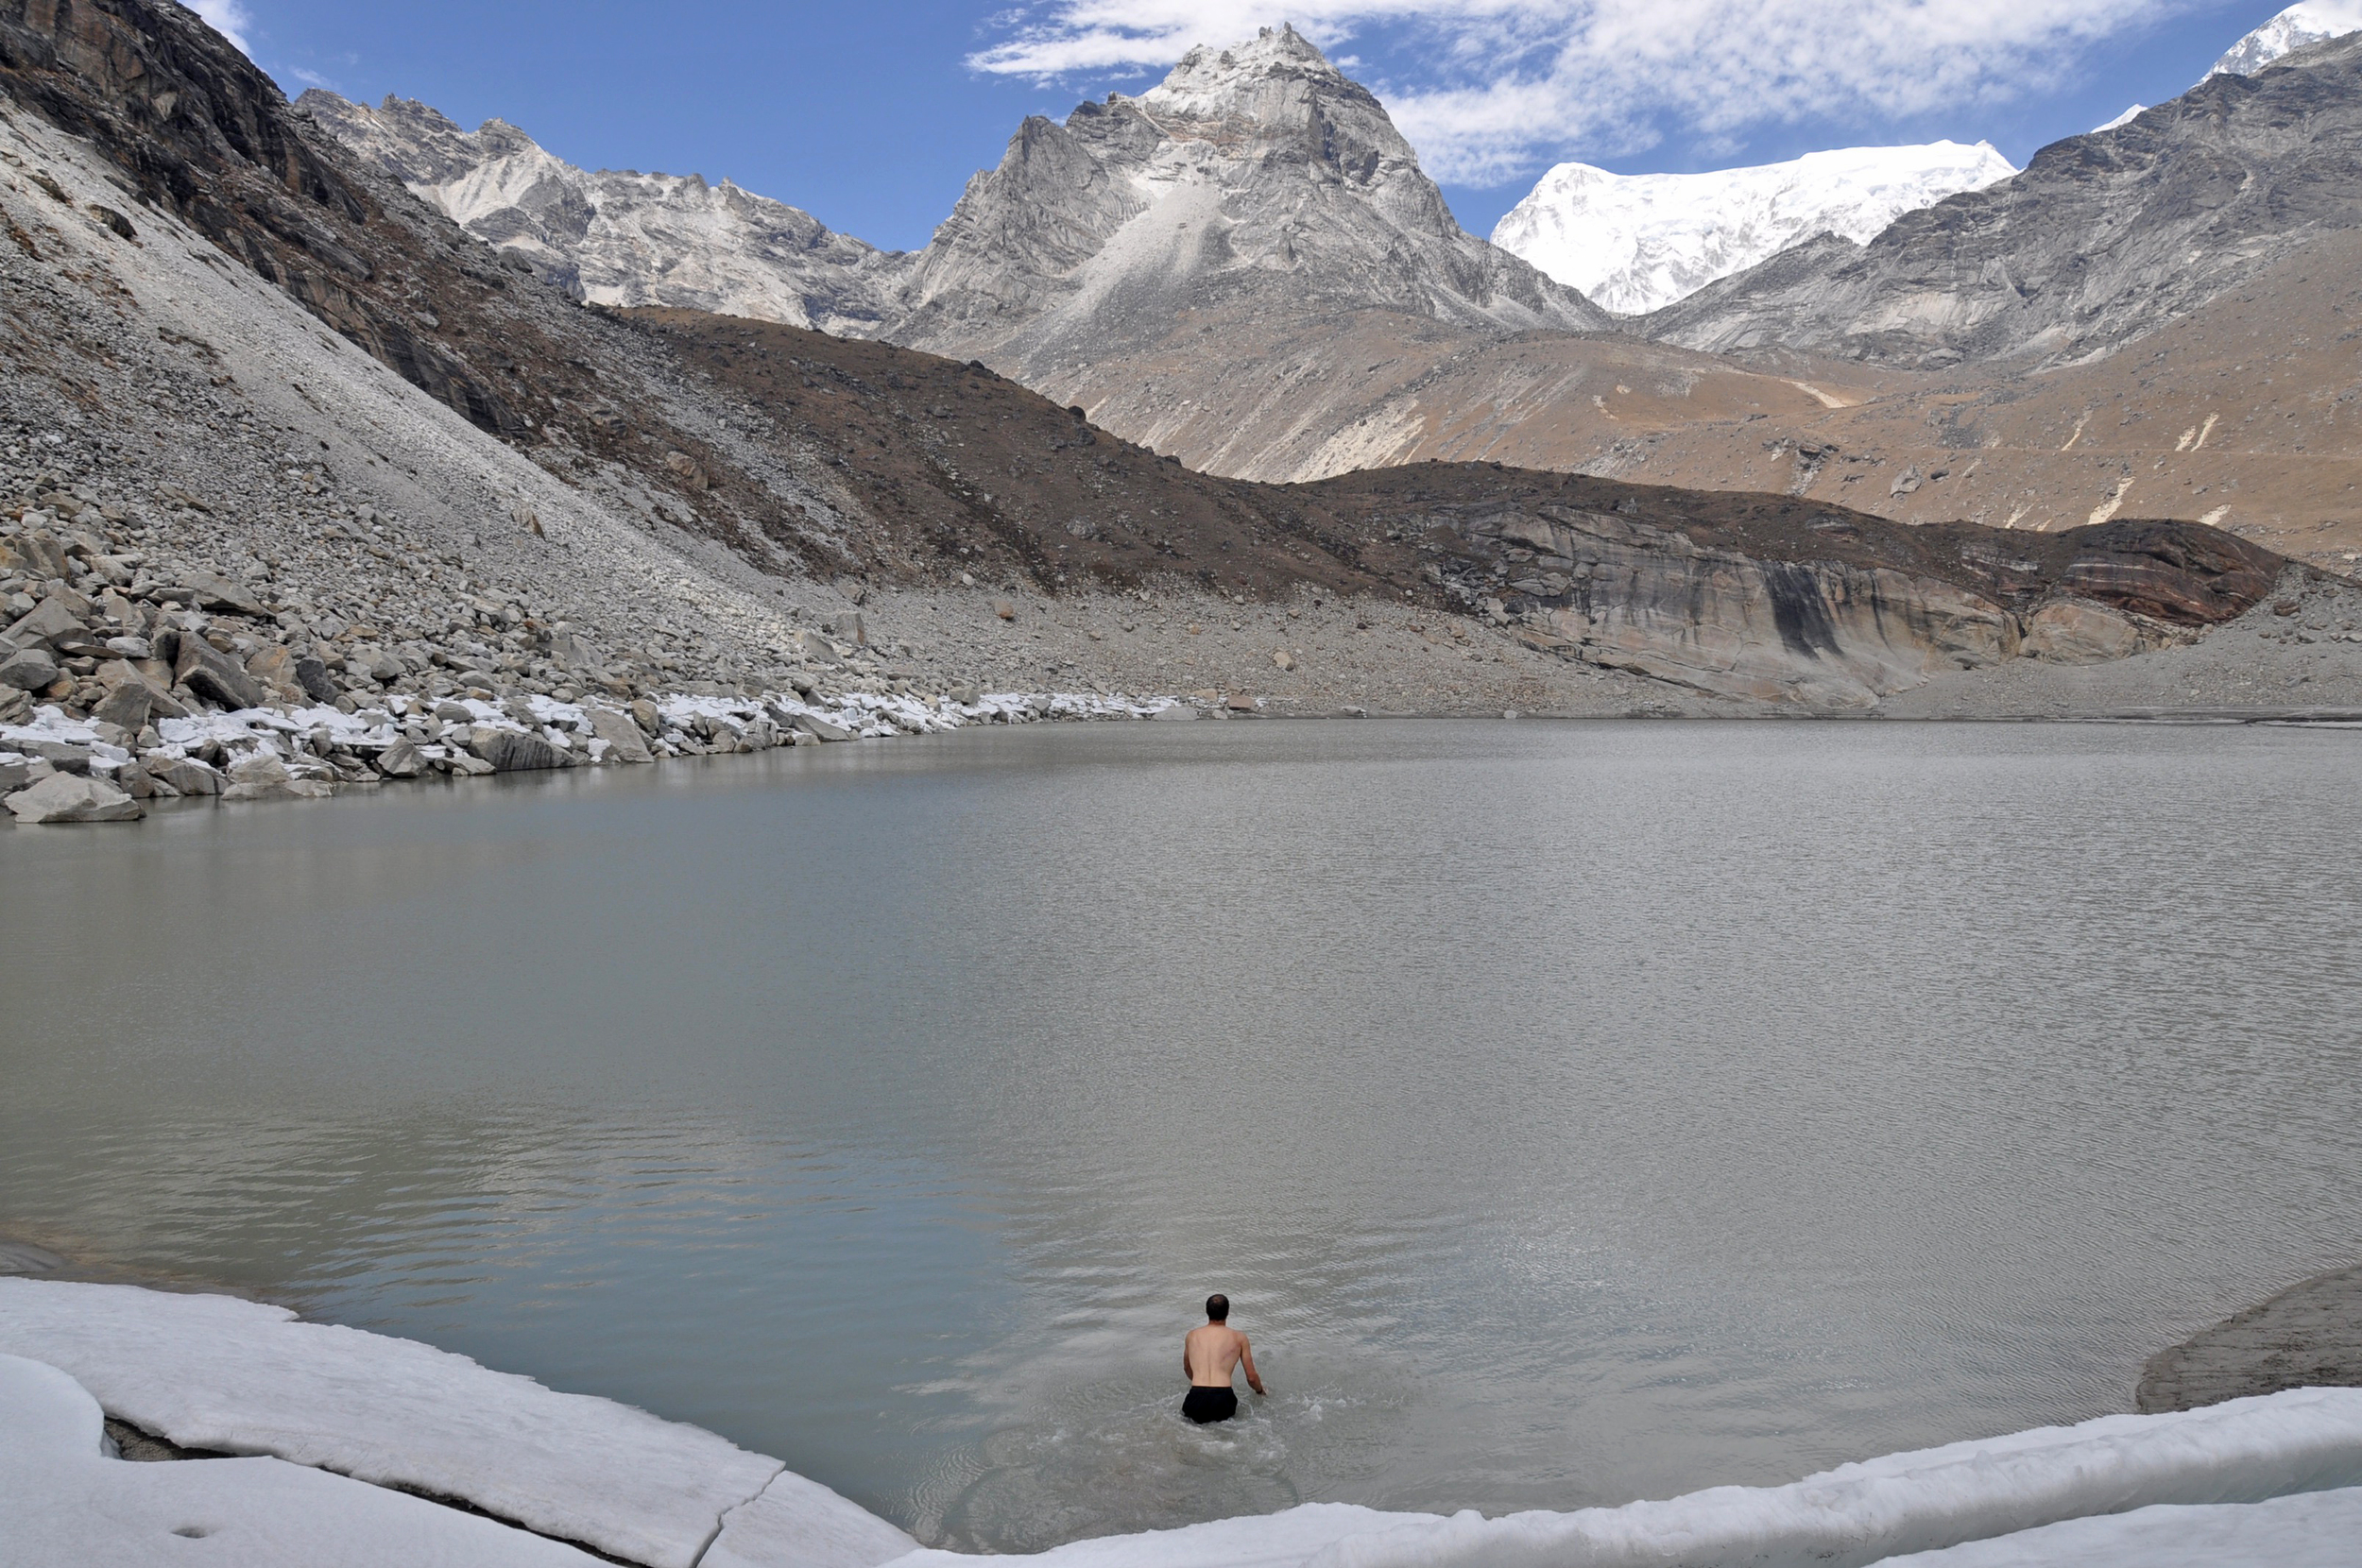 Gokyo swimming in a glacial lake